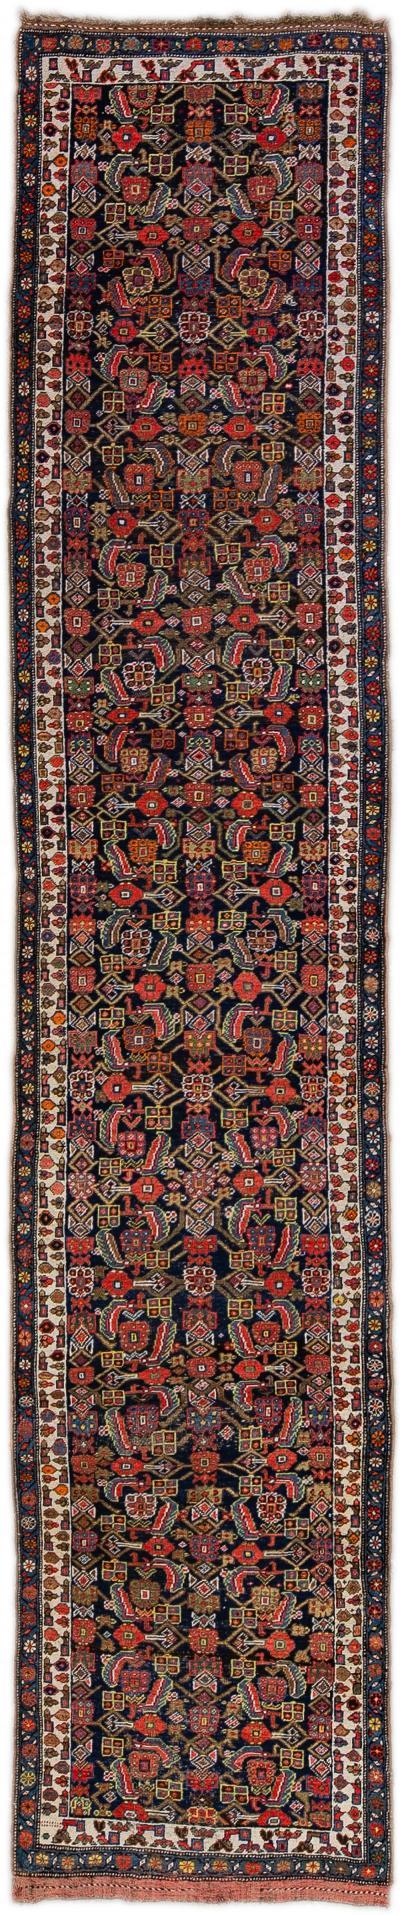 Antique Bidjar Handmade All Over Designed Blue Wool Runner